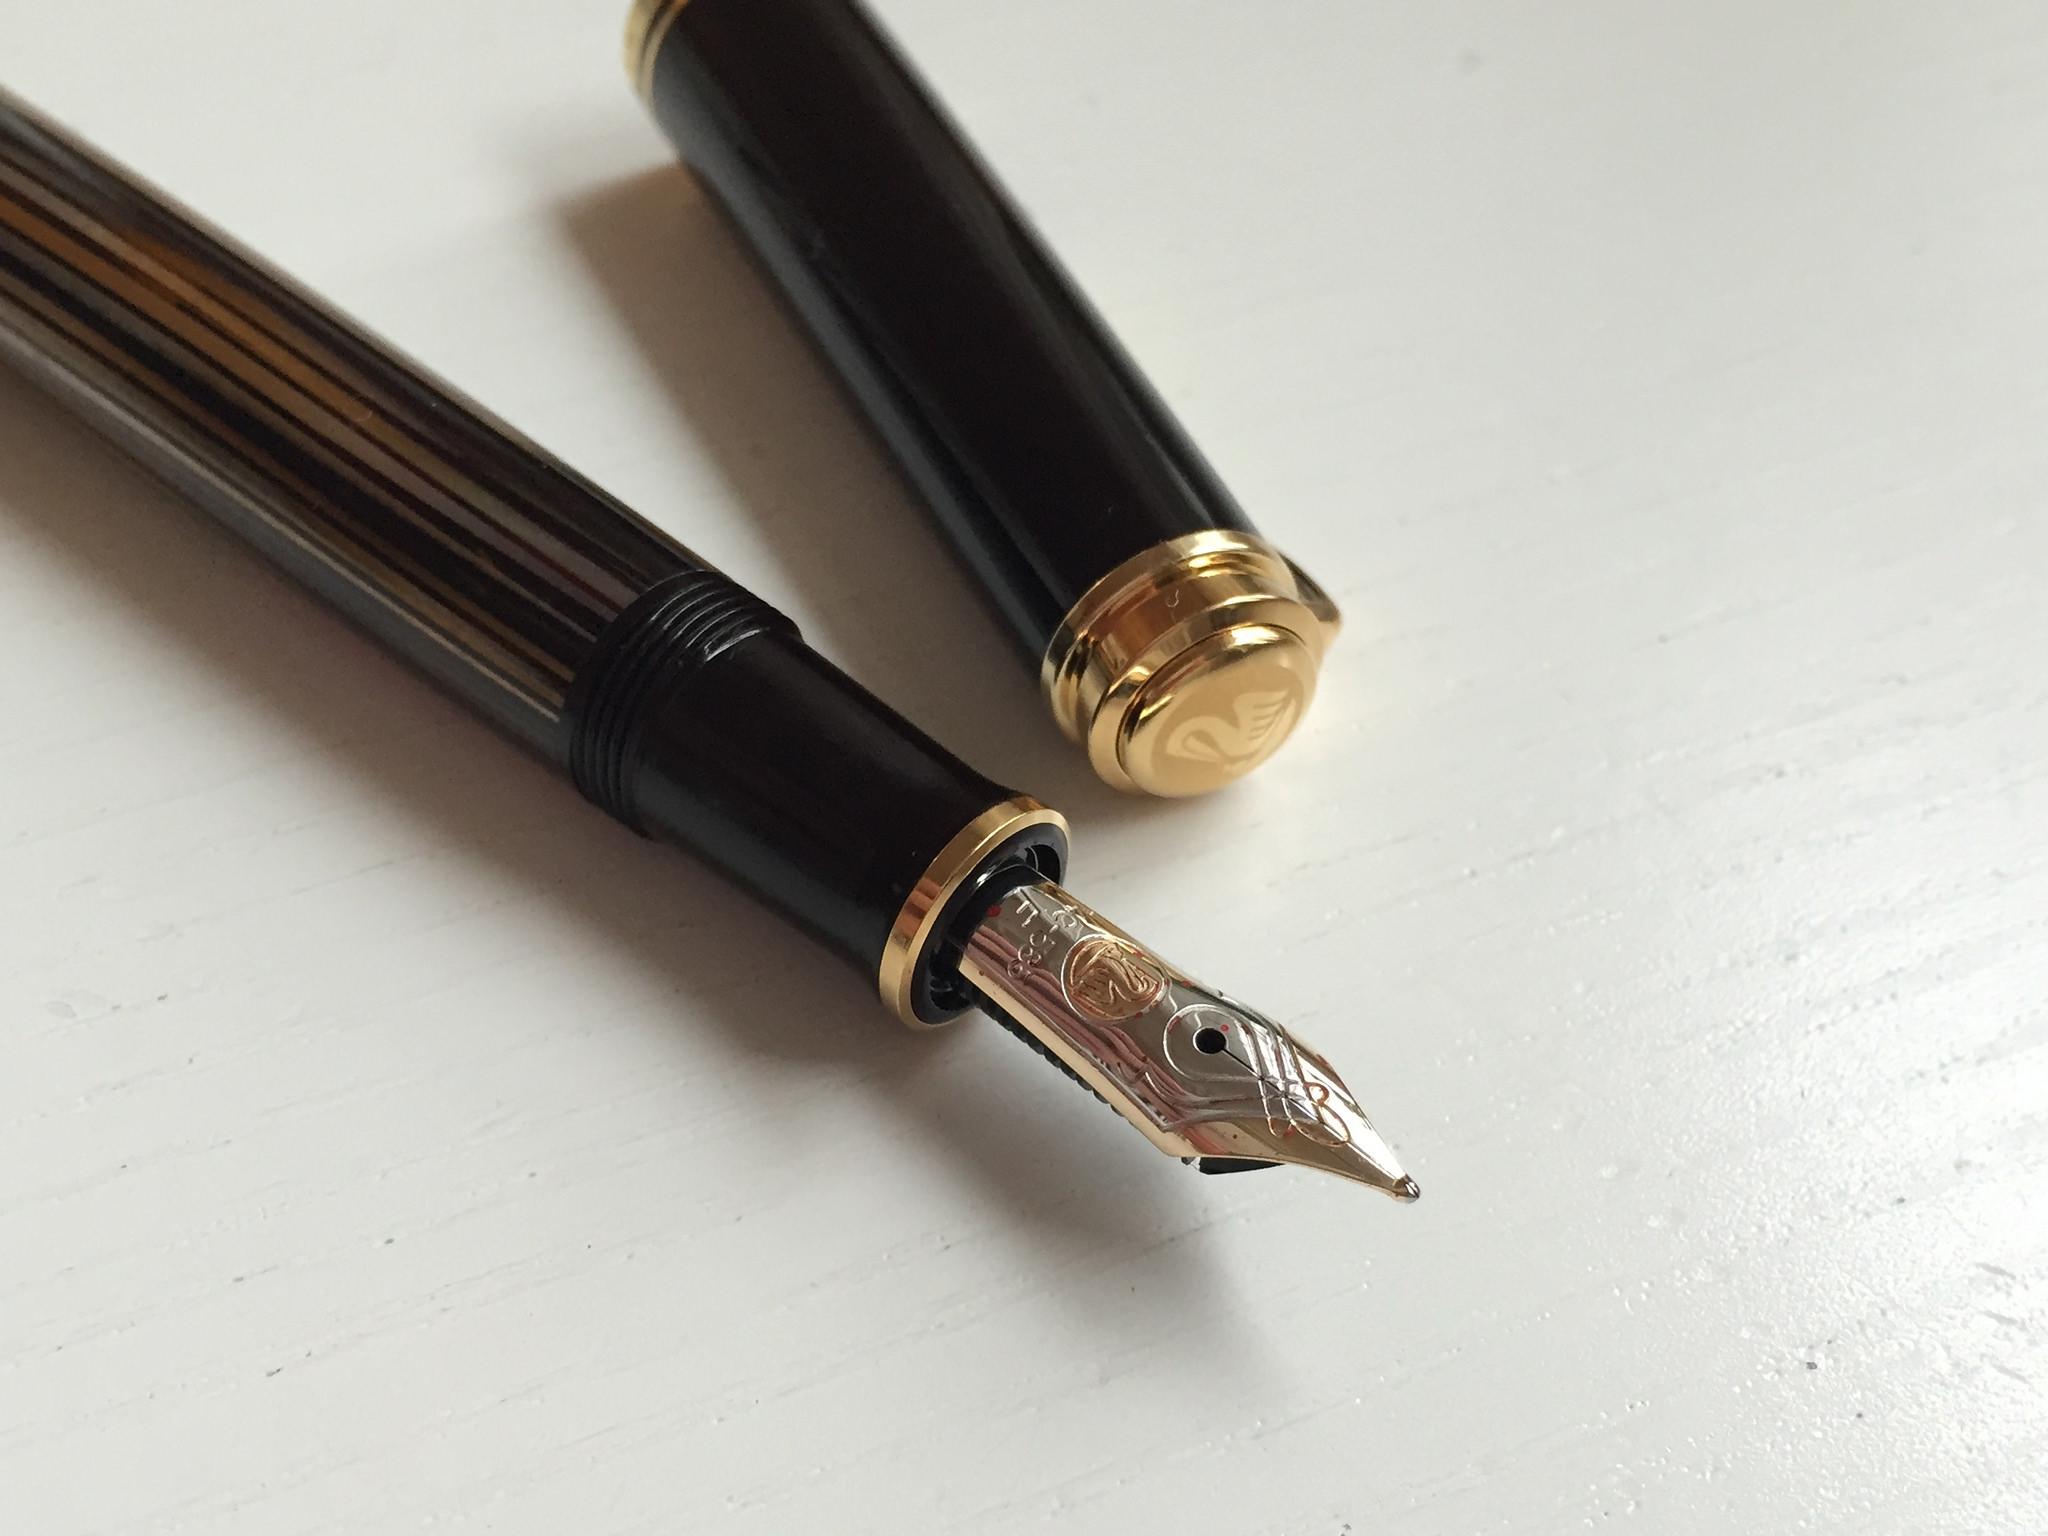 pelikan-m400-tortoiseshell-brown-2016-special-edition_1